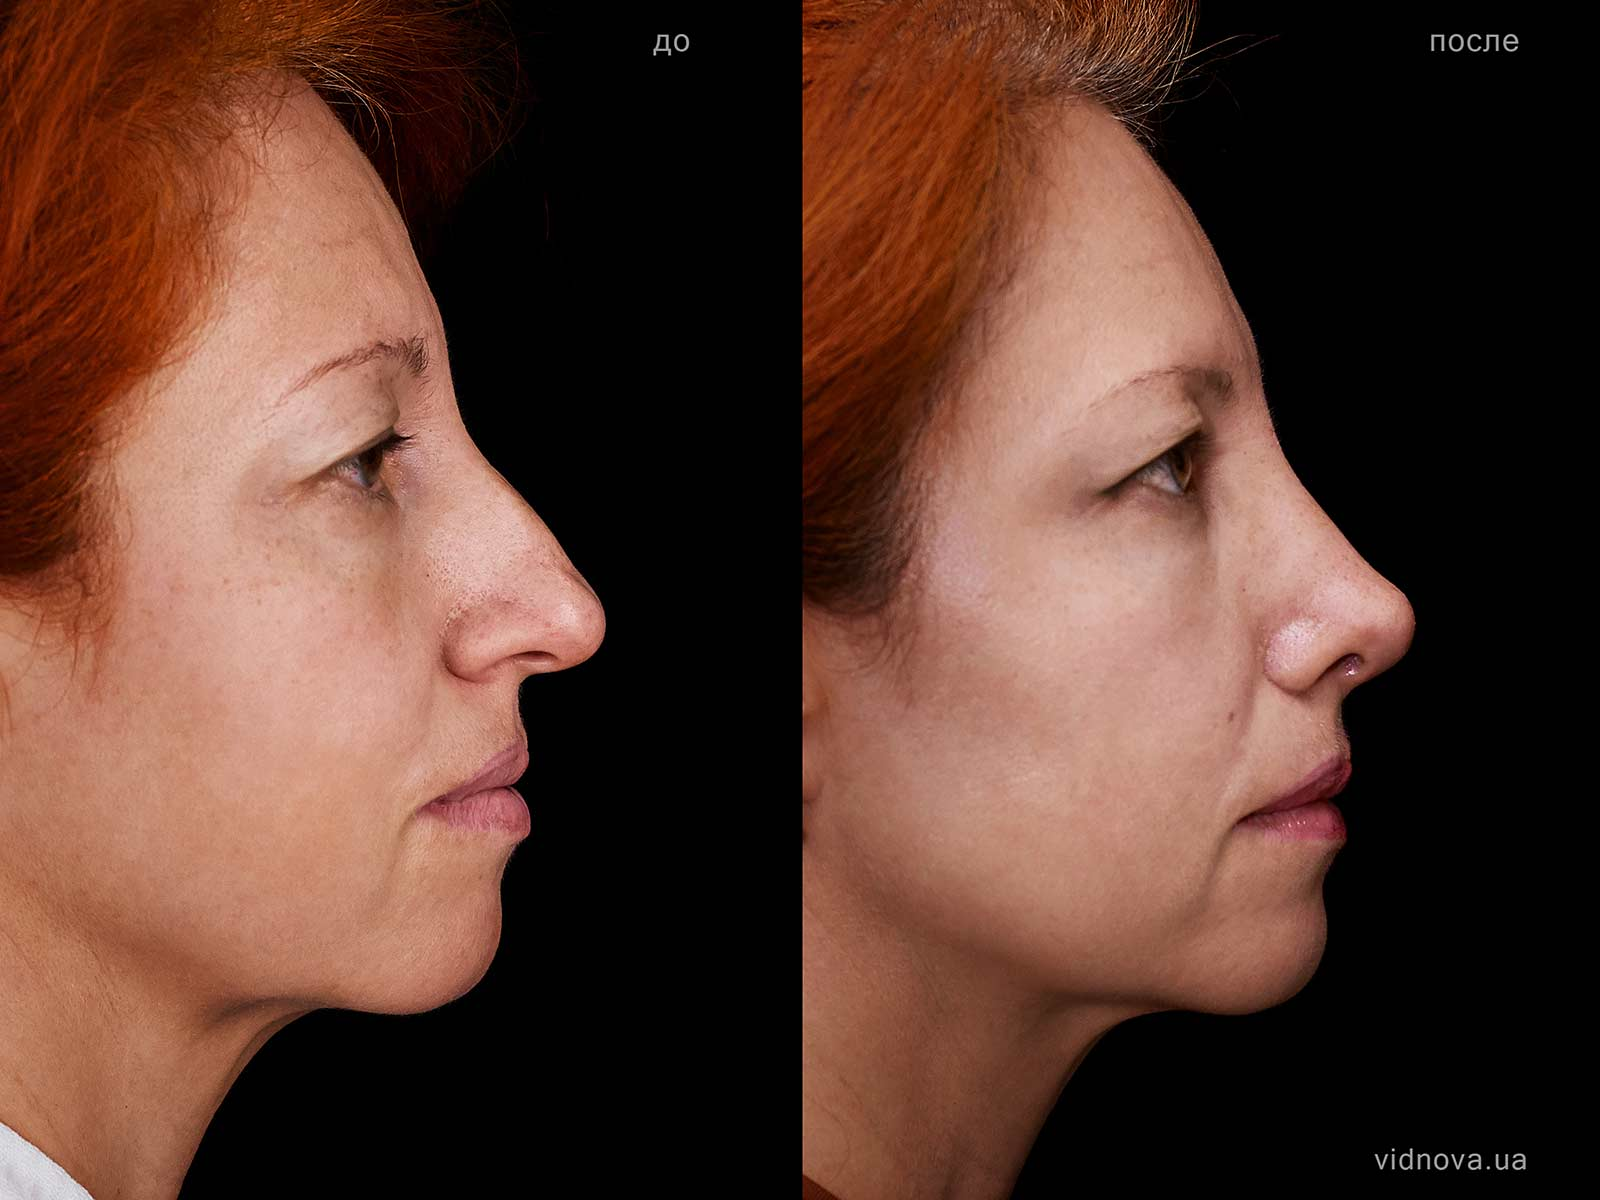 Коррекция формы и функции носа (риносептопластика)